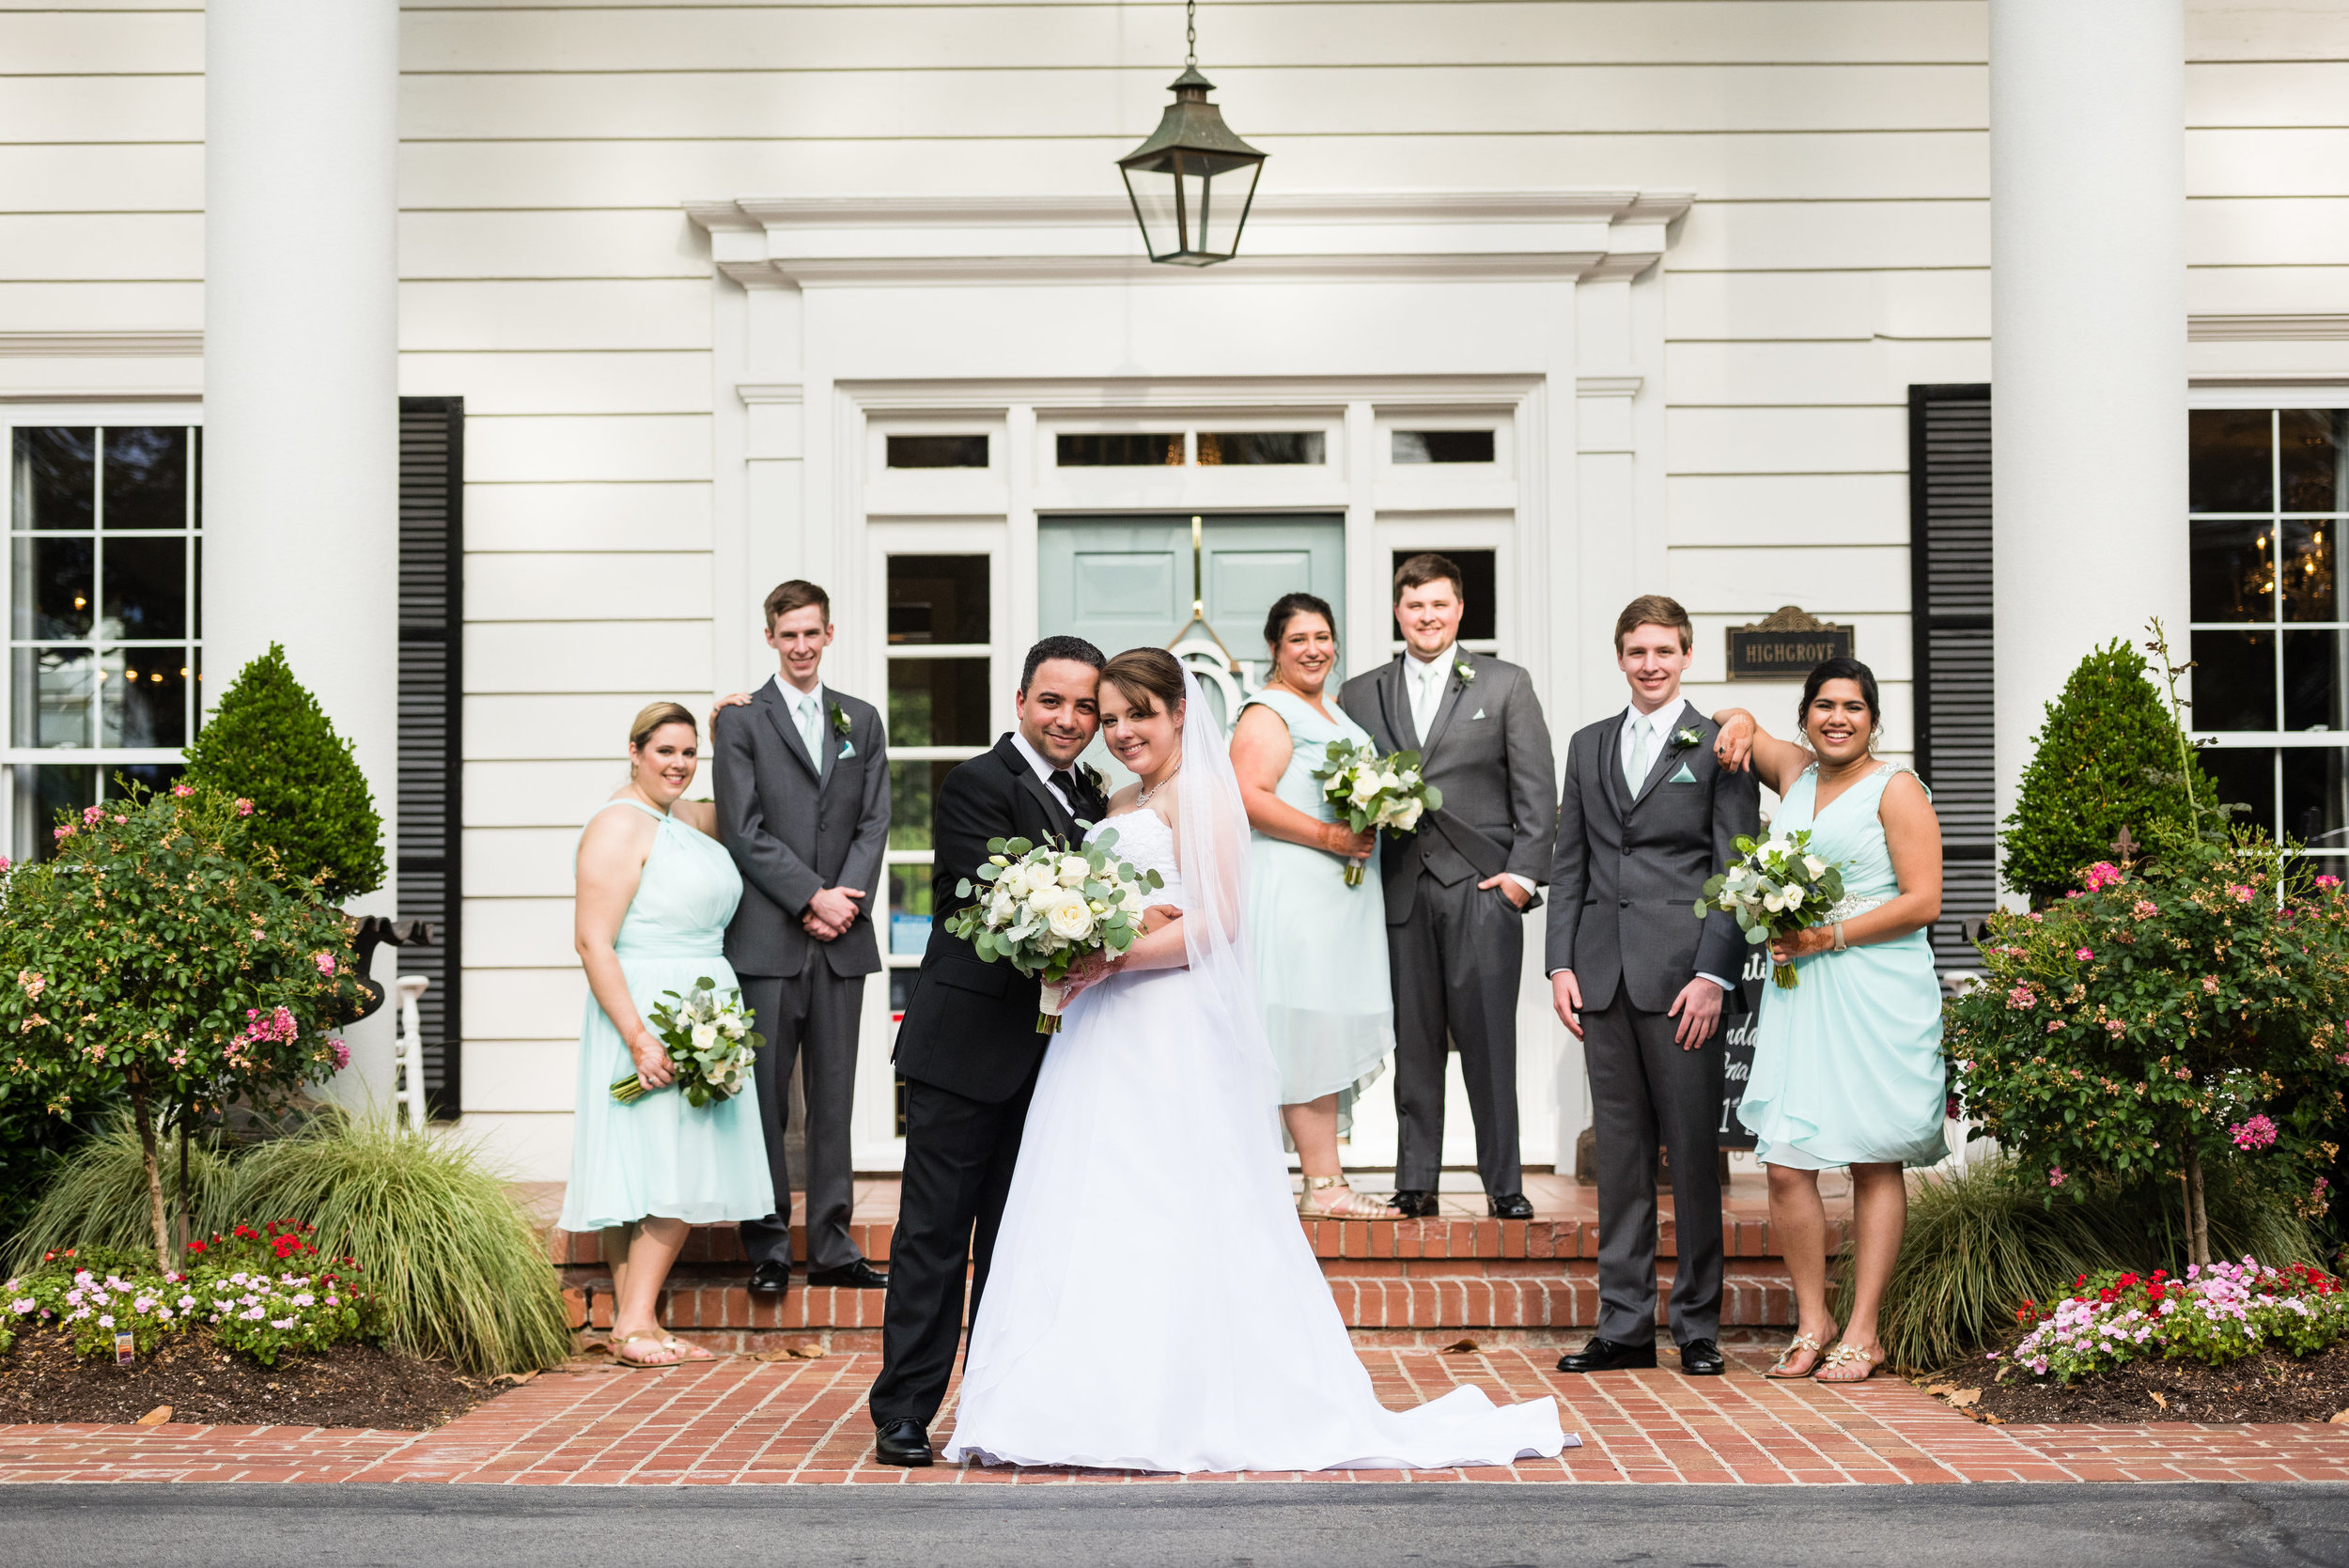 Amanda+Anas_Wedding_635 Highgrove Estate - Kate Pope Photography.JPG